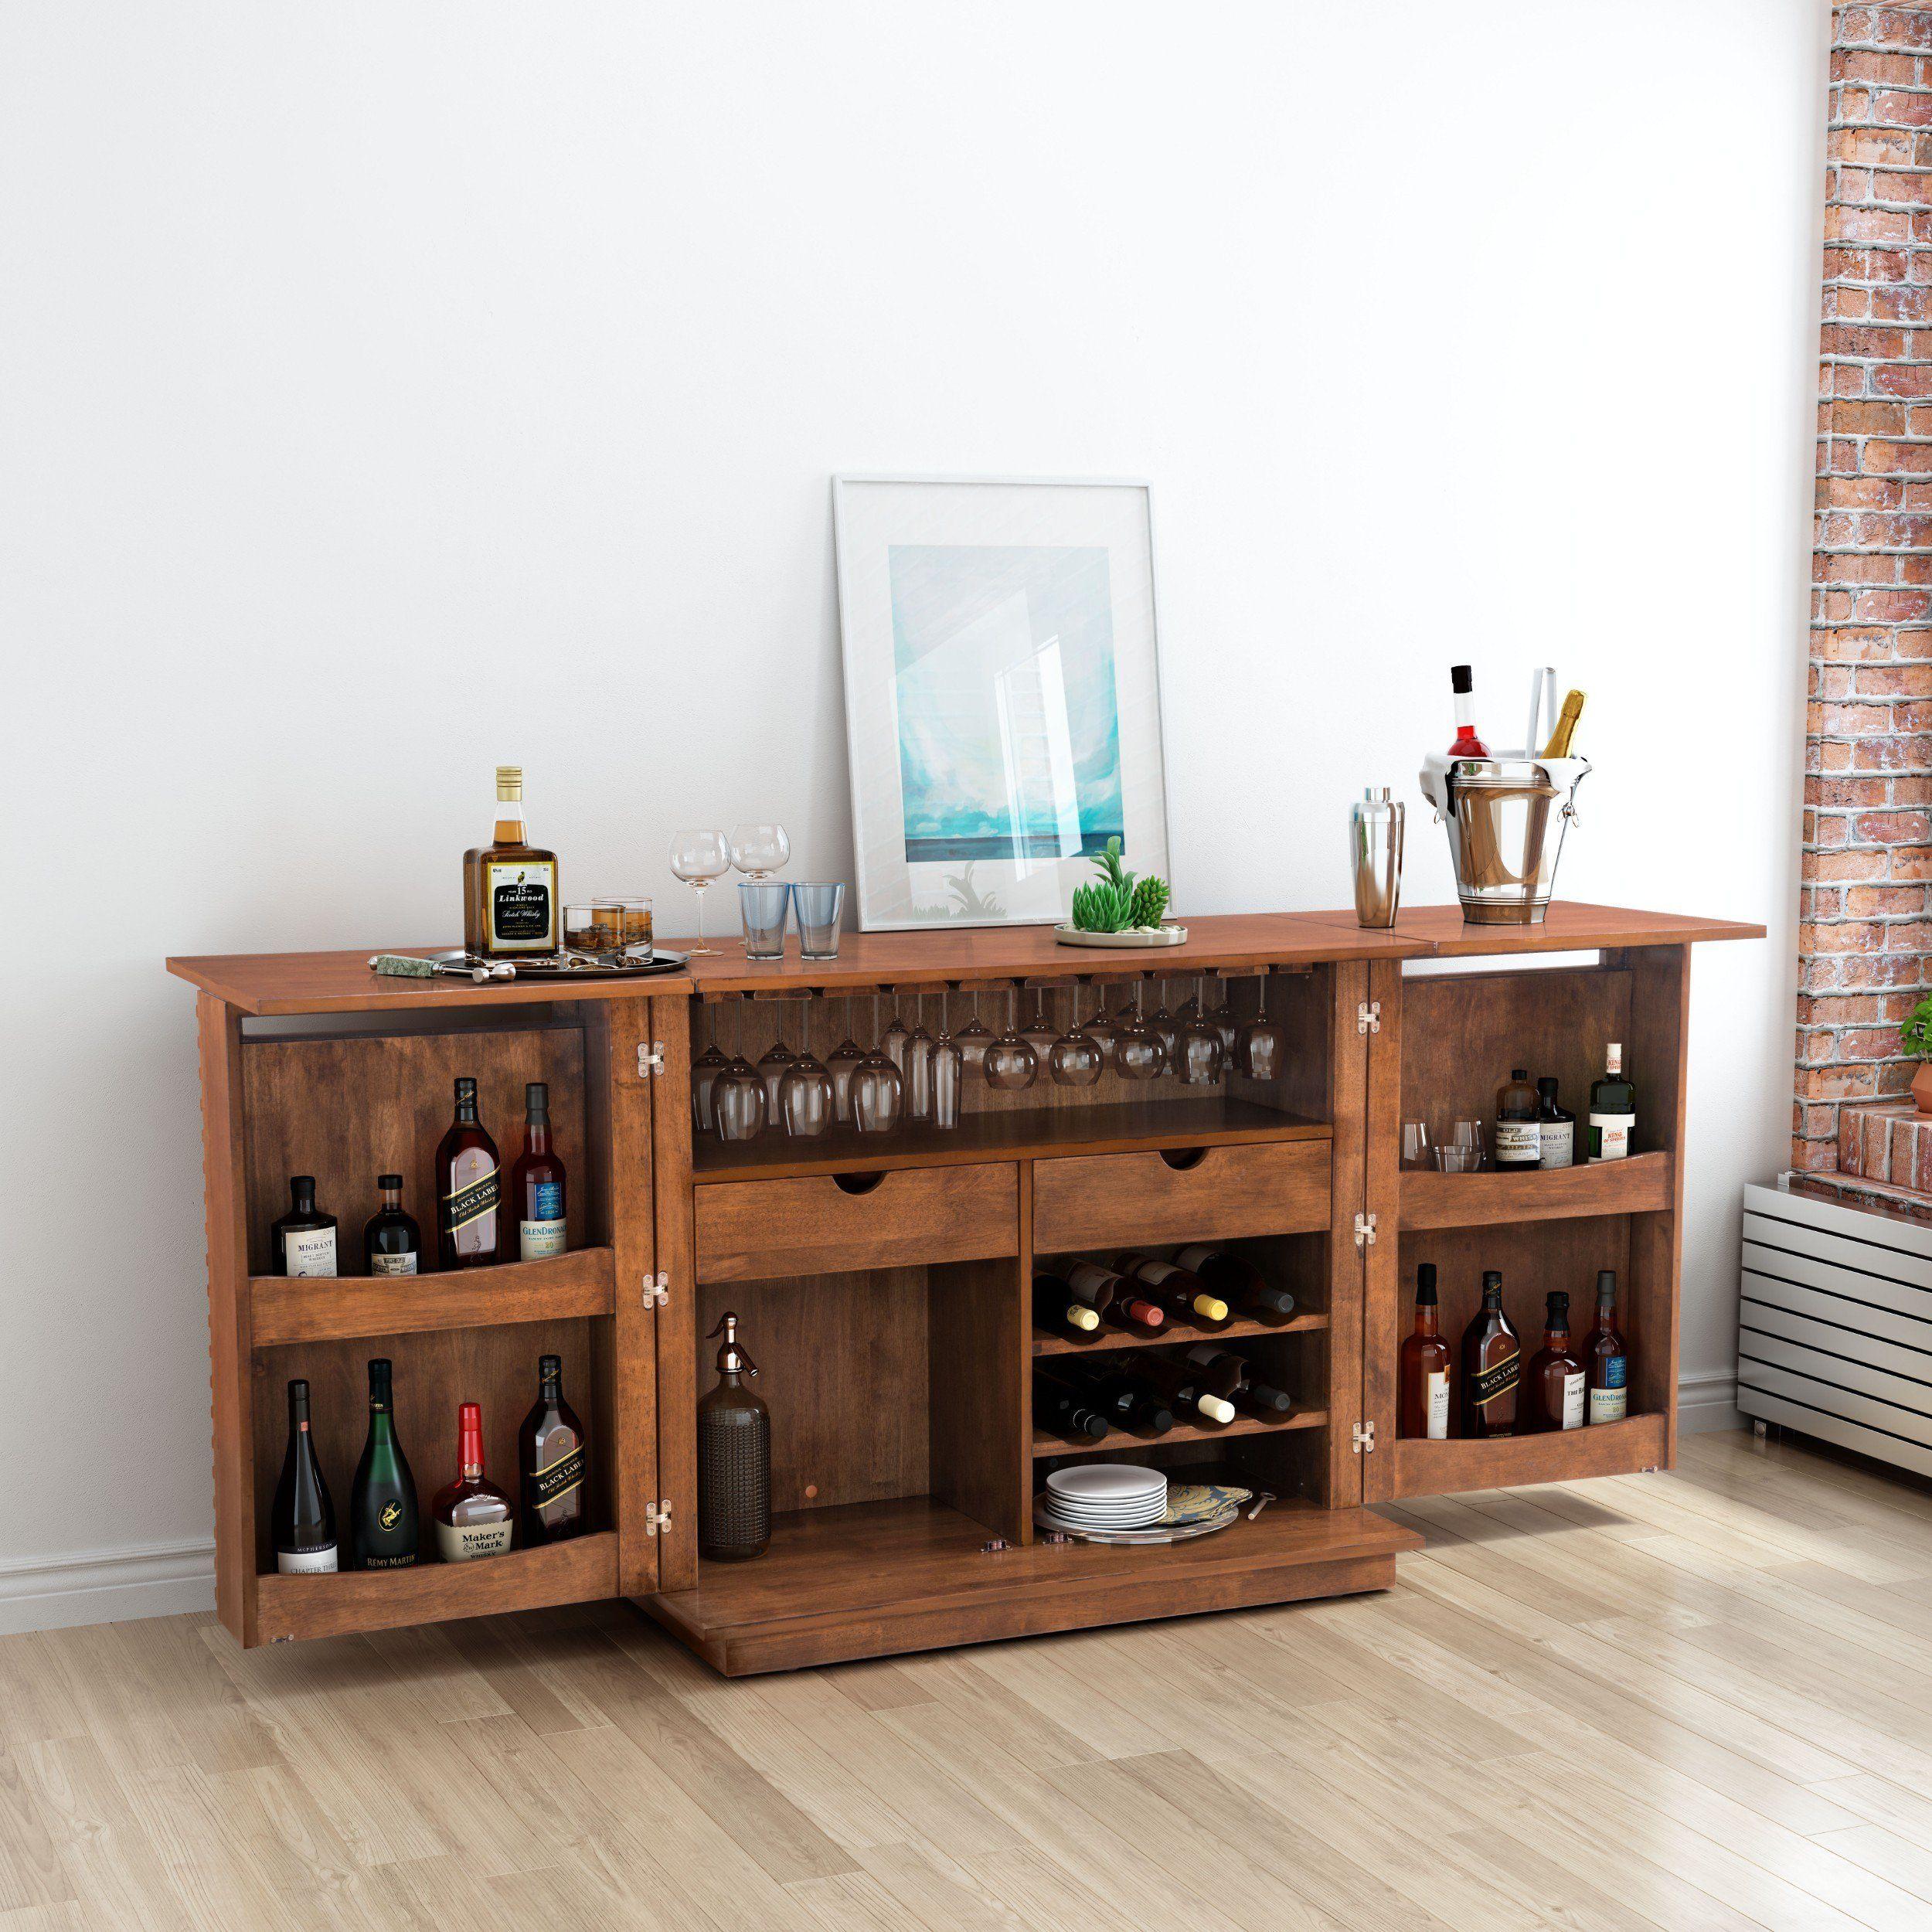 Linea Bar Cabinet Walnut Storage Furniture Home Bar Cabinet Living Room Bar Bar Cabinet